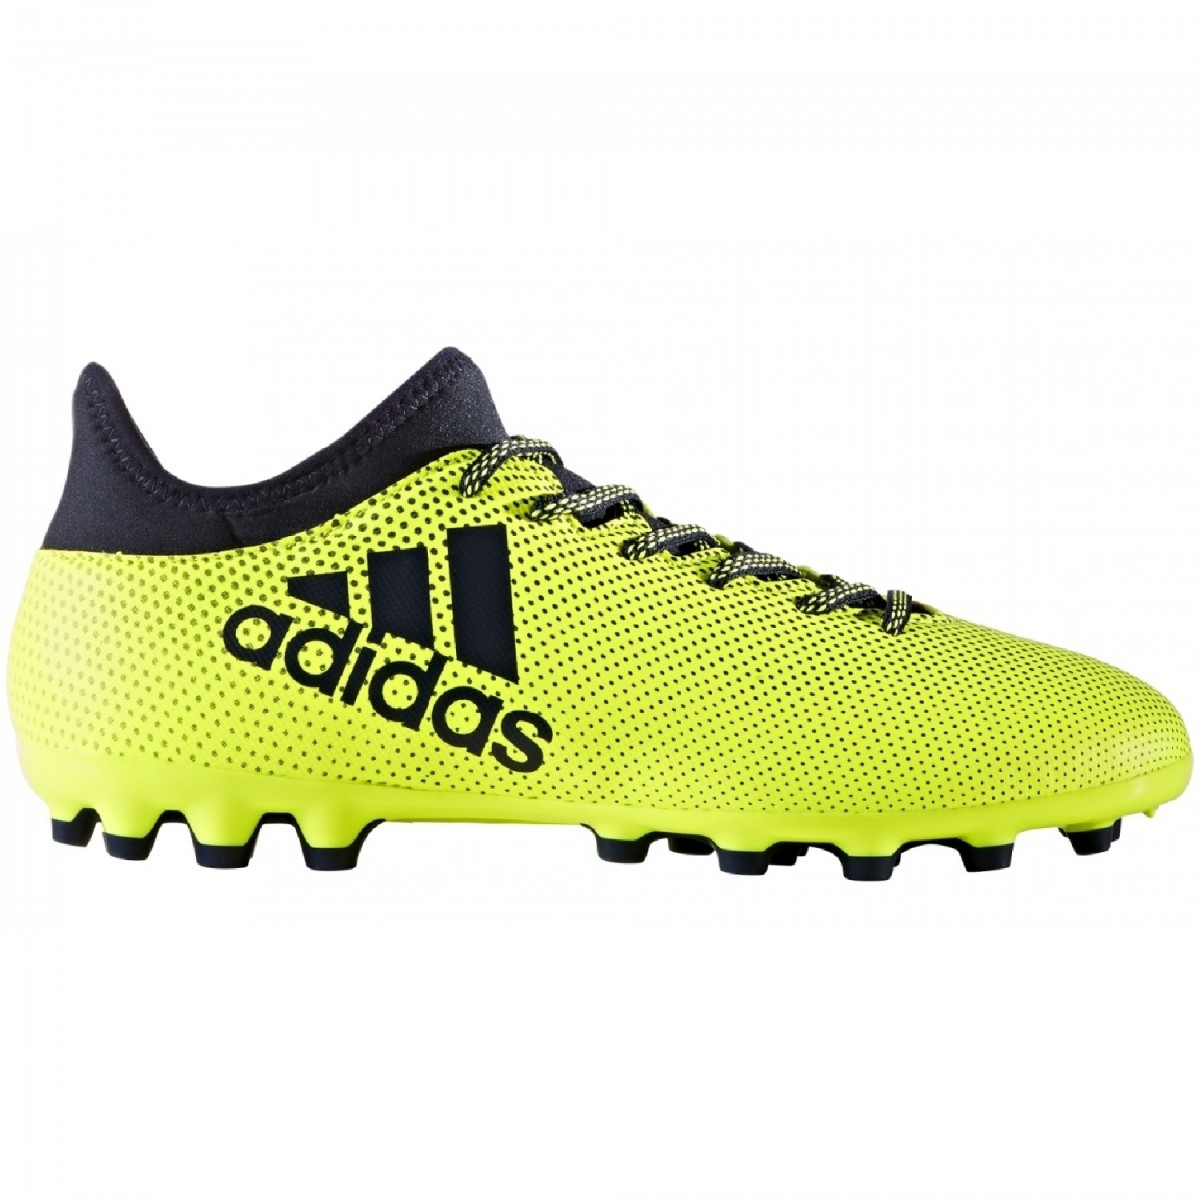 adidas X 17.3 AG Herren Fußballschuhe Kunstrasen gelb blau